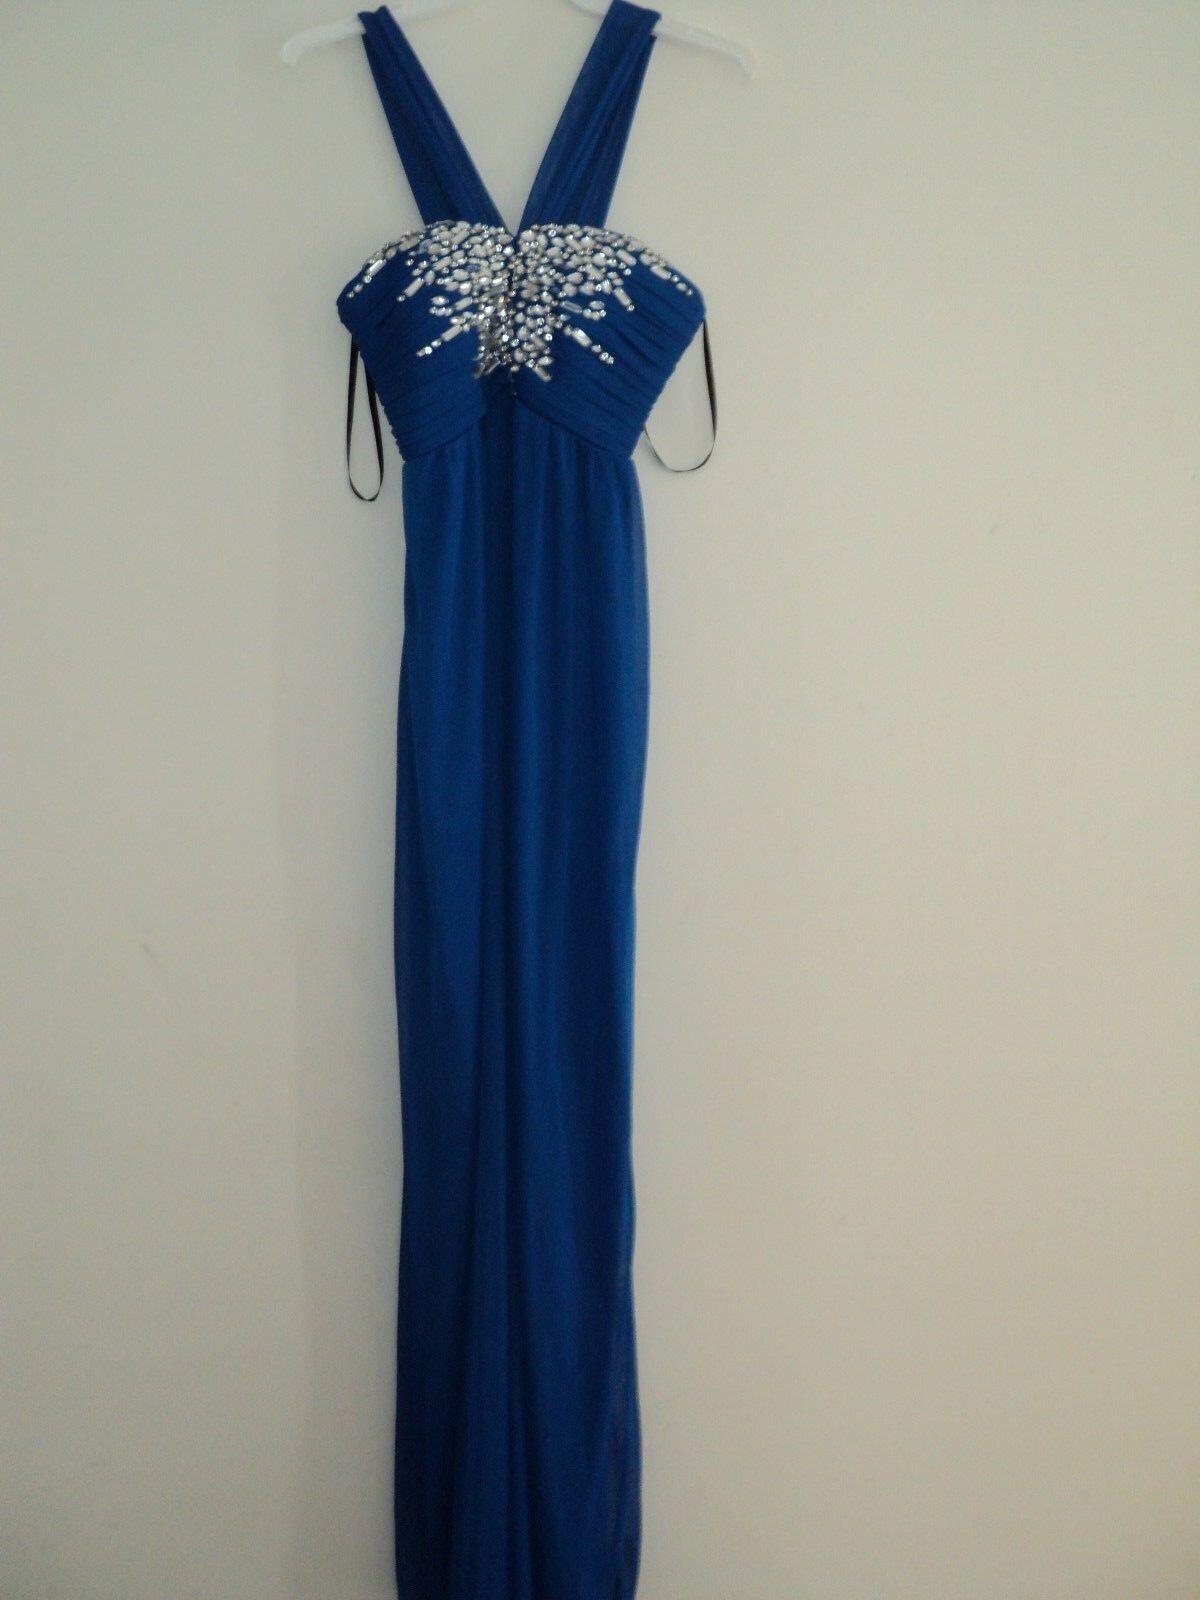 NEW Jodi Kristopher Royal bluee Jewels Junior Prom Home Coming Dress Size 3